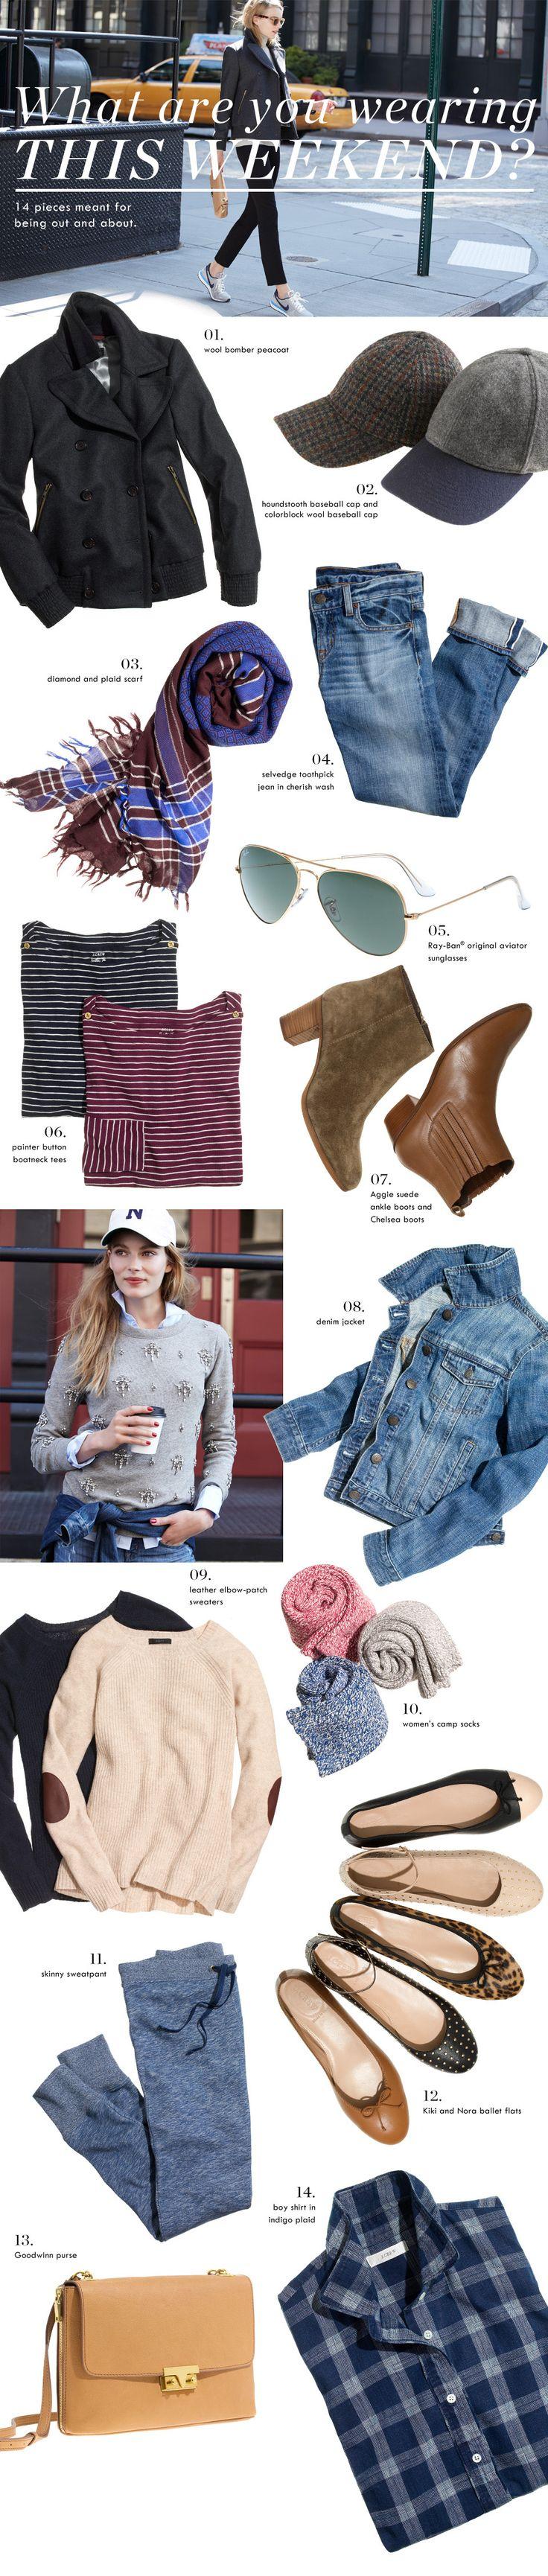 J.Crew Casual + Chic Weekend Style | boyfriend jeans + baseball caps